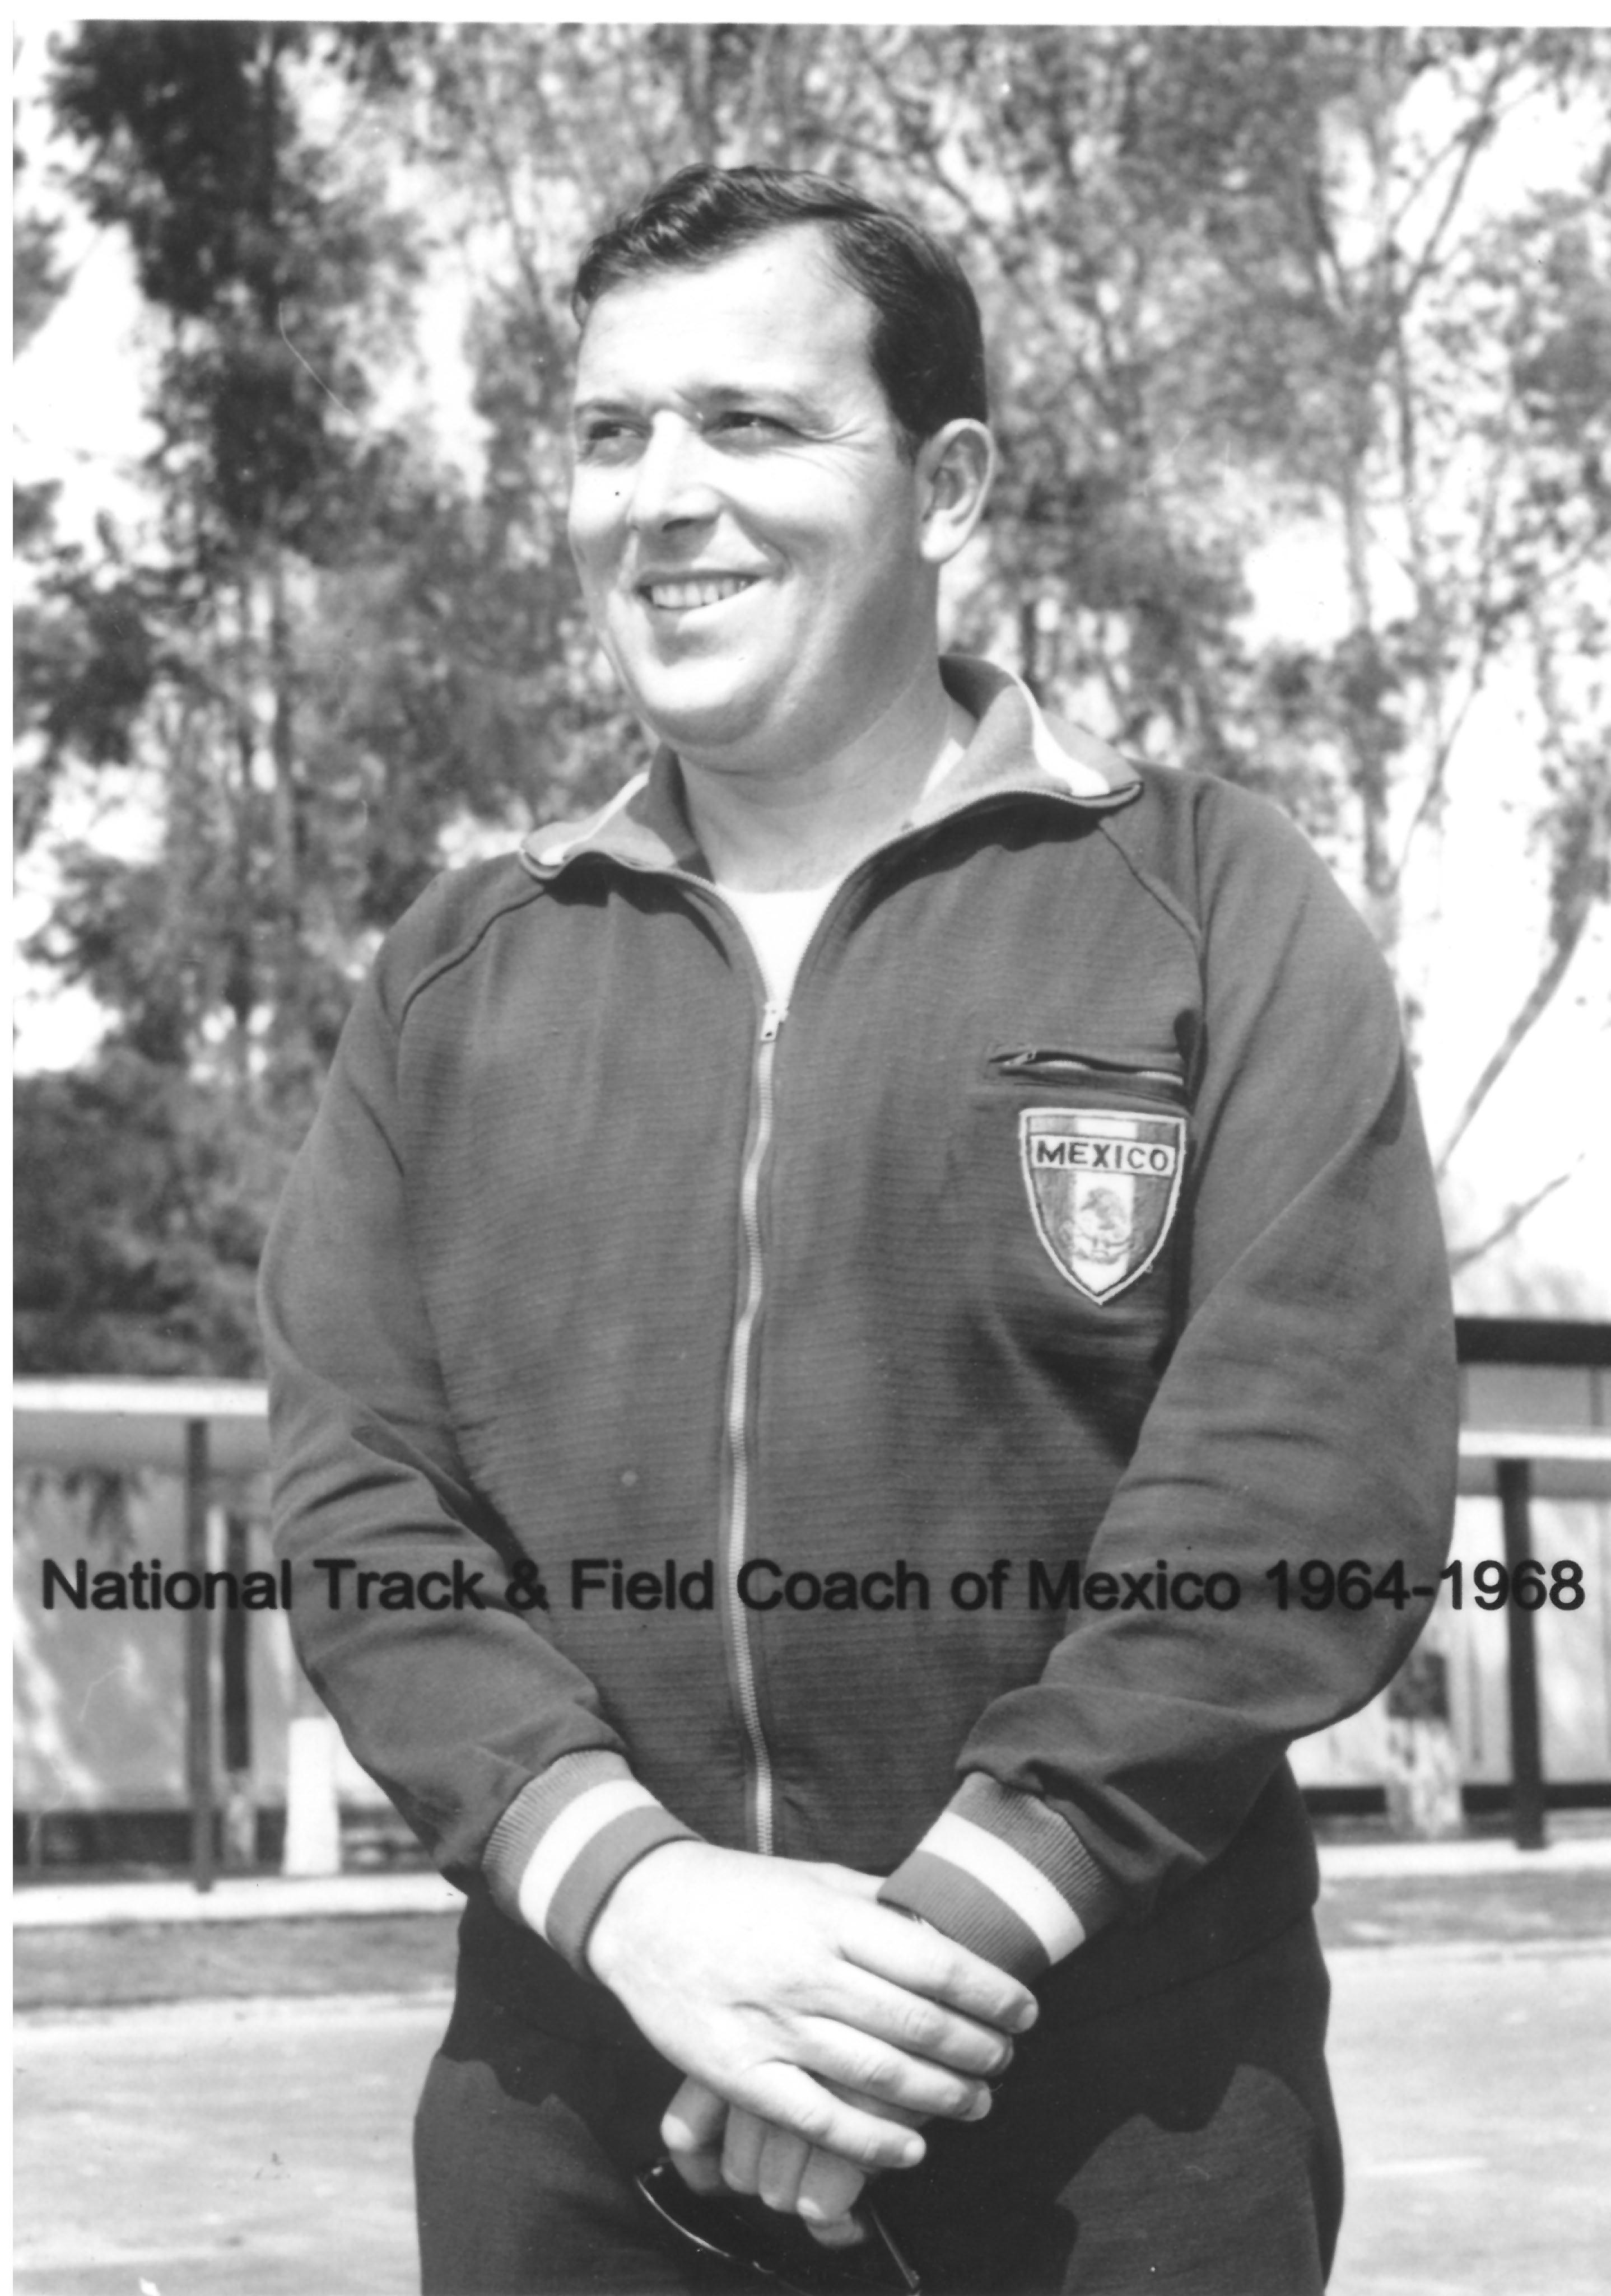 Bert Bonanno Coach for Mexico